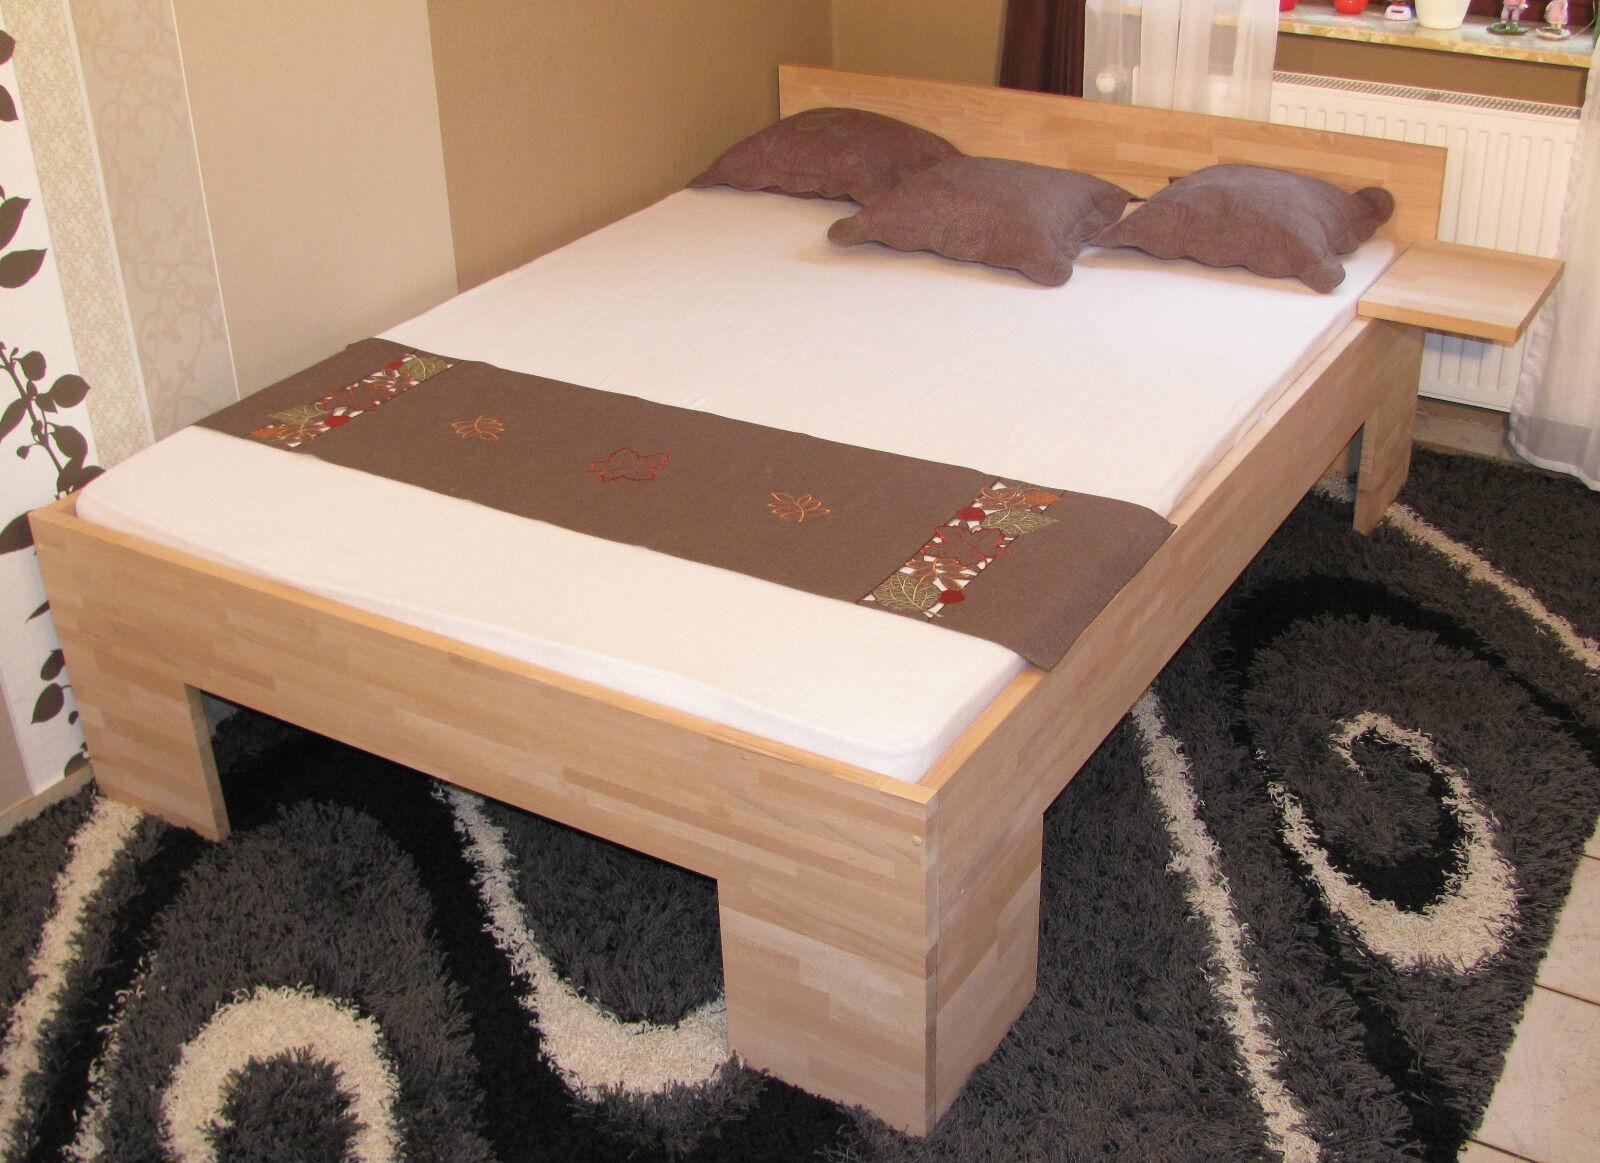 massivholzbett 140x200 fu ii doppelbett buche g stebett. Black Bedroom Furniture Sets. Home Design Ideas